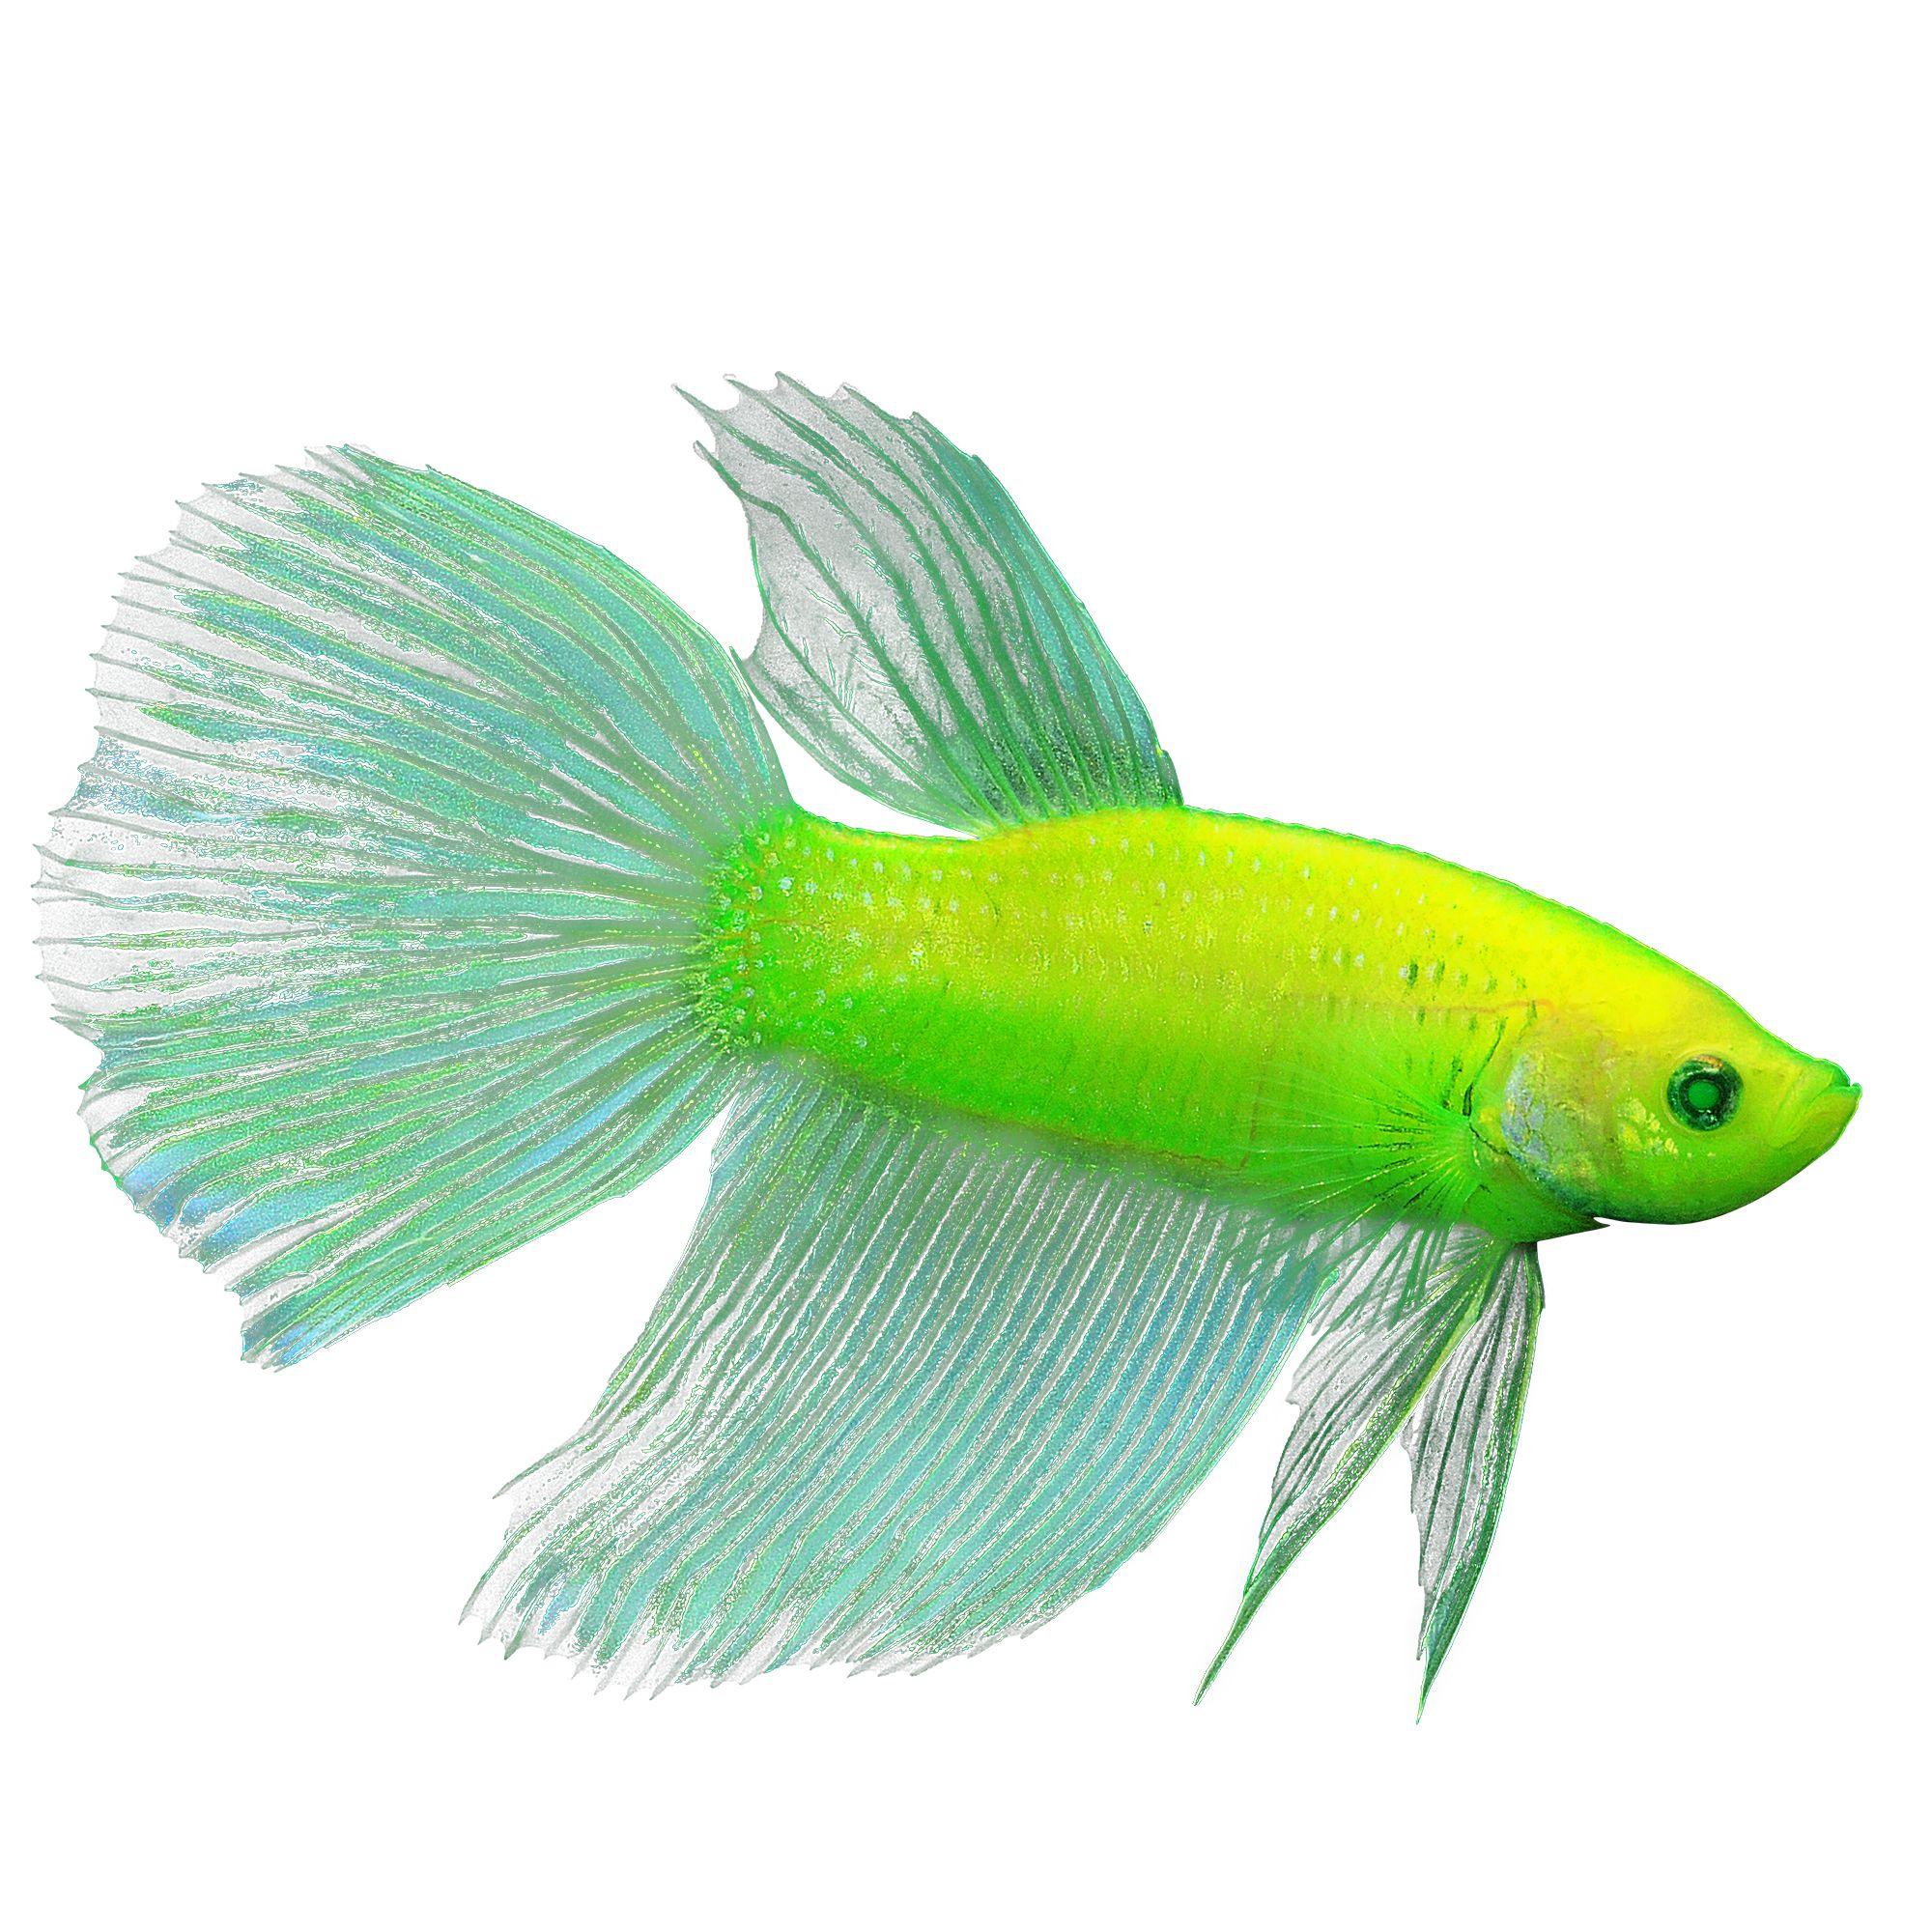 Glofish Electric Green Premium Male Betta Fish Fish Goldfish Betta More Petsmart